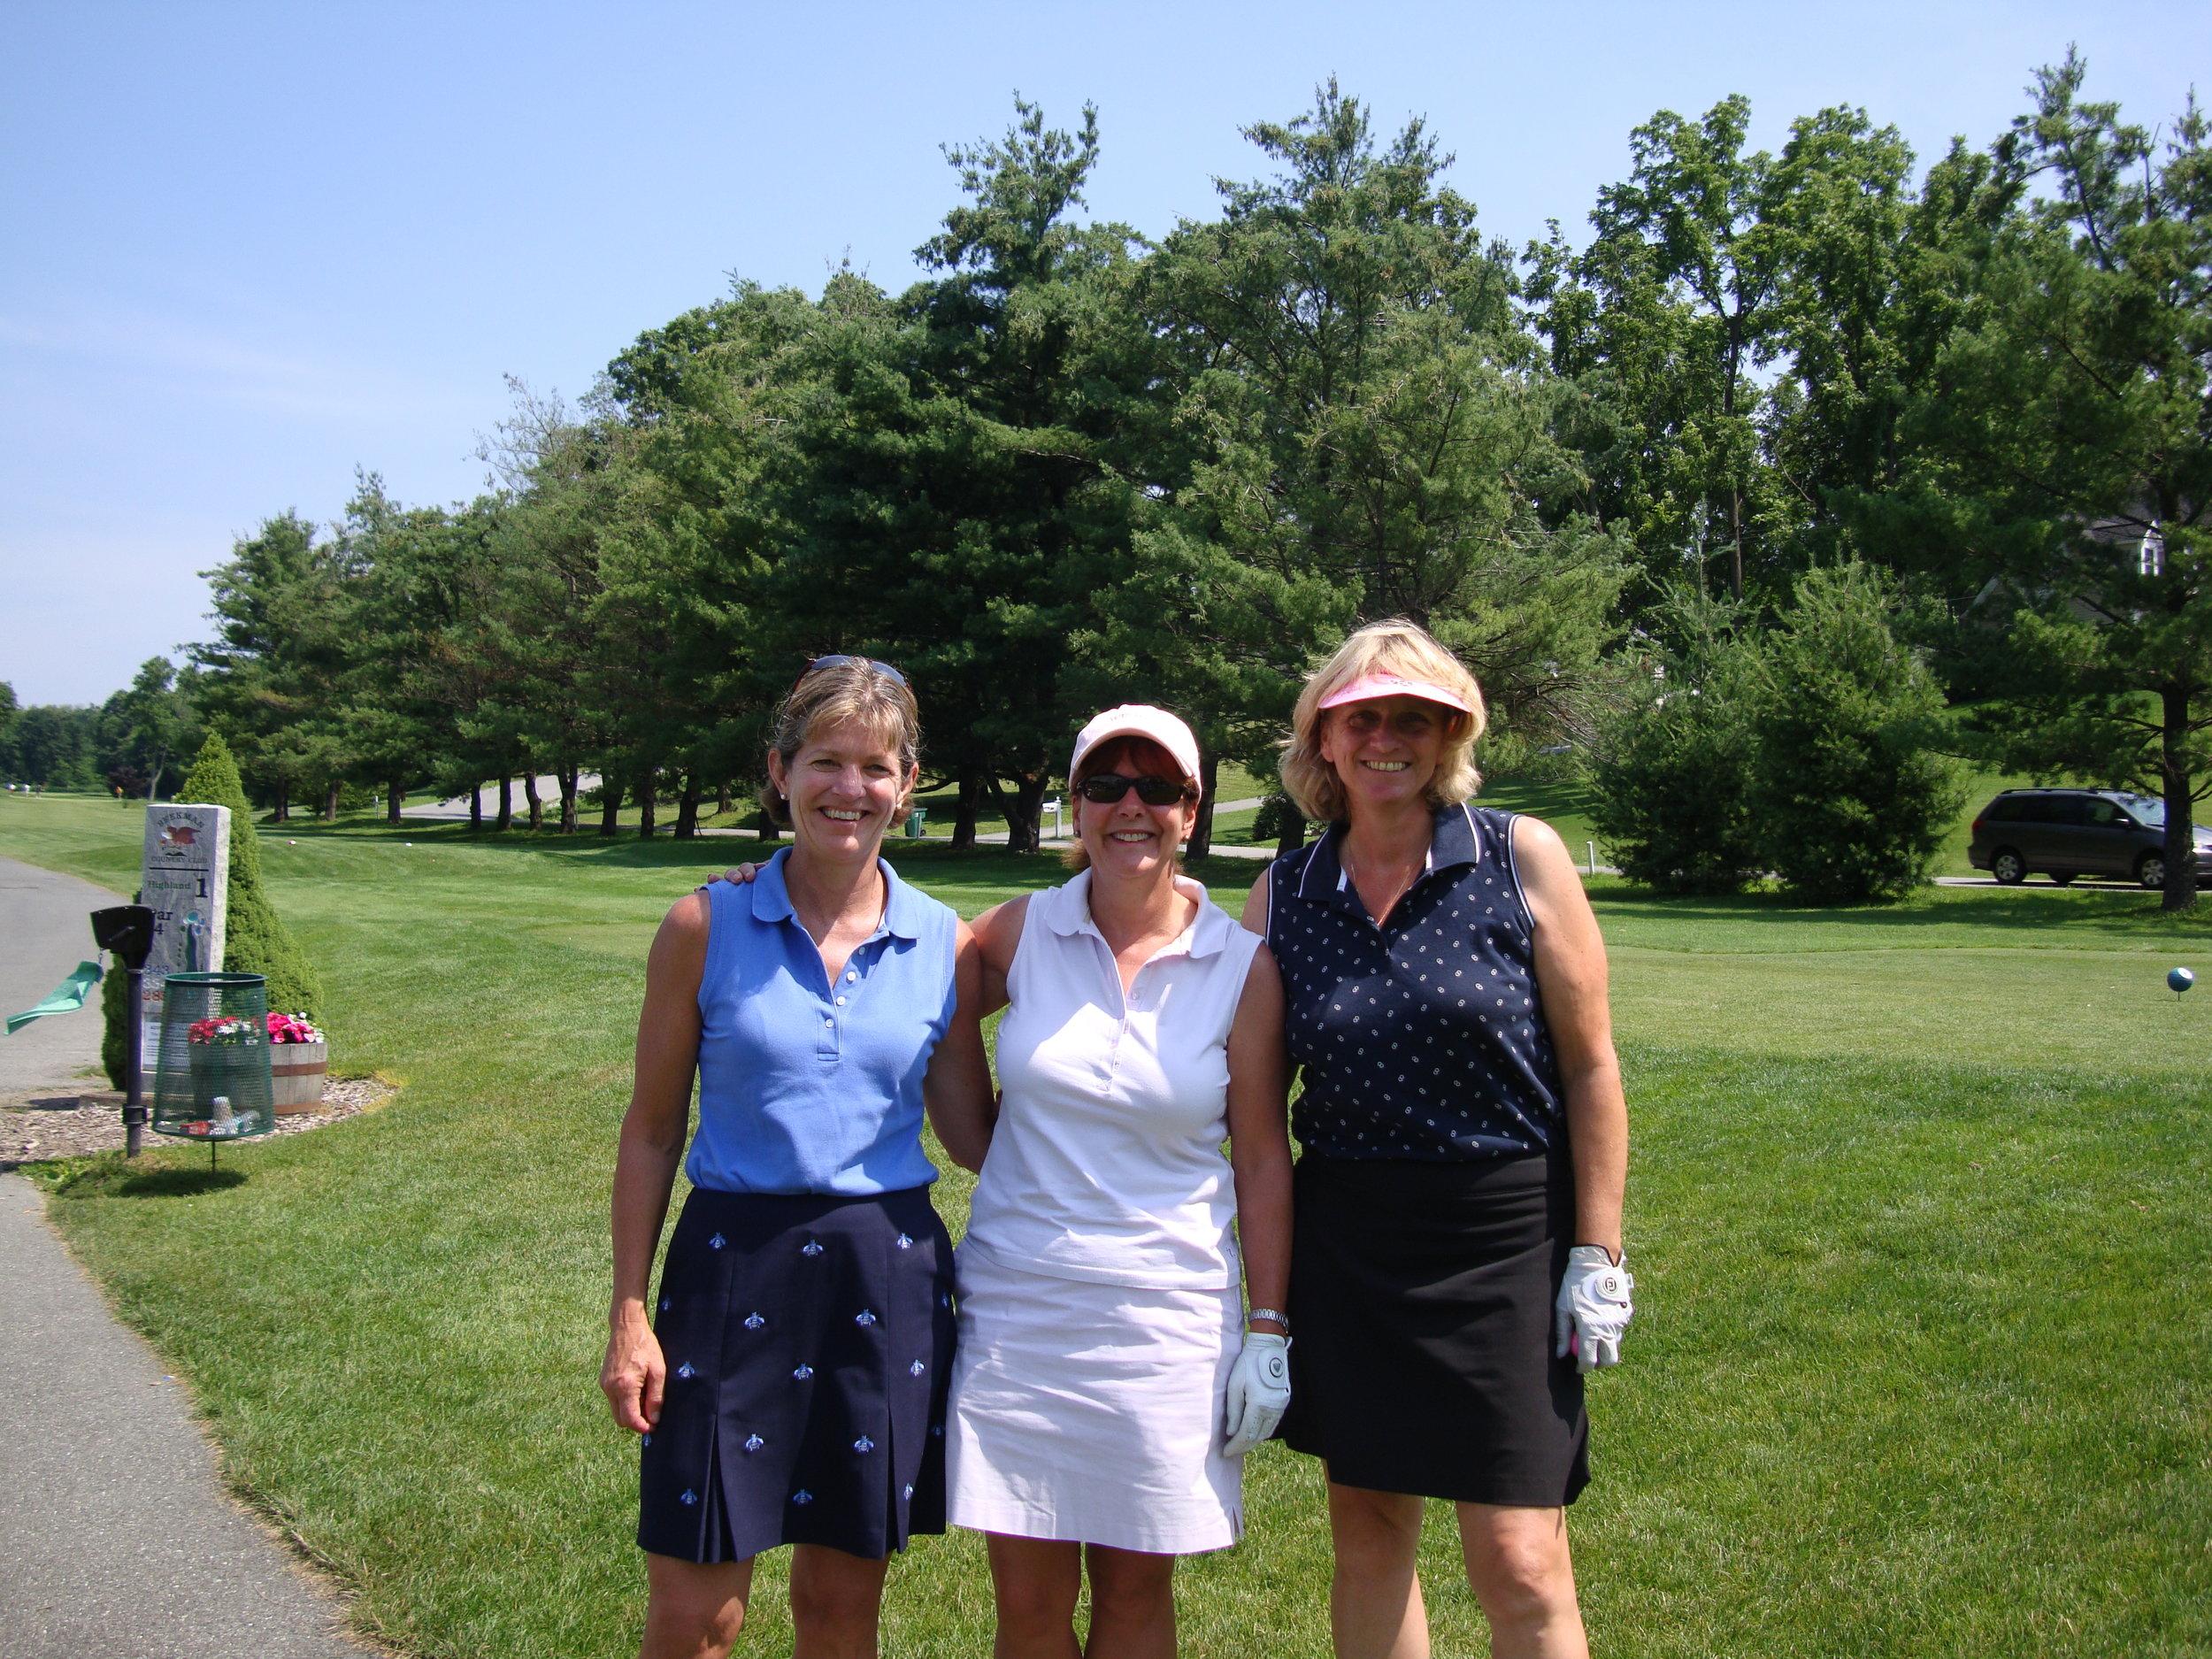 Susan, Trish and Gill